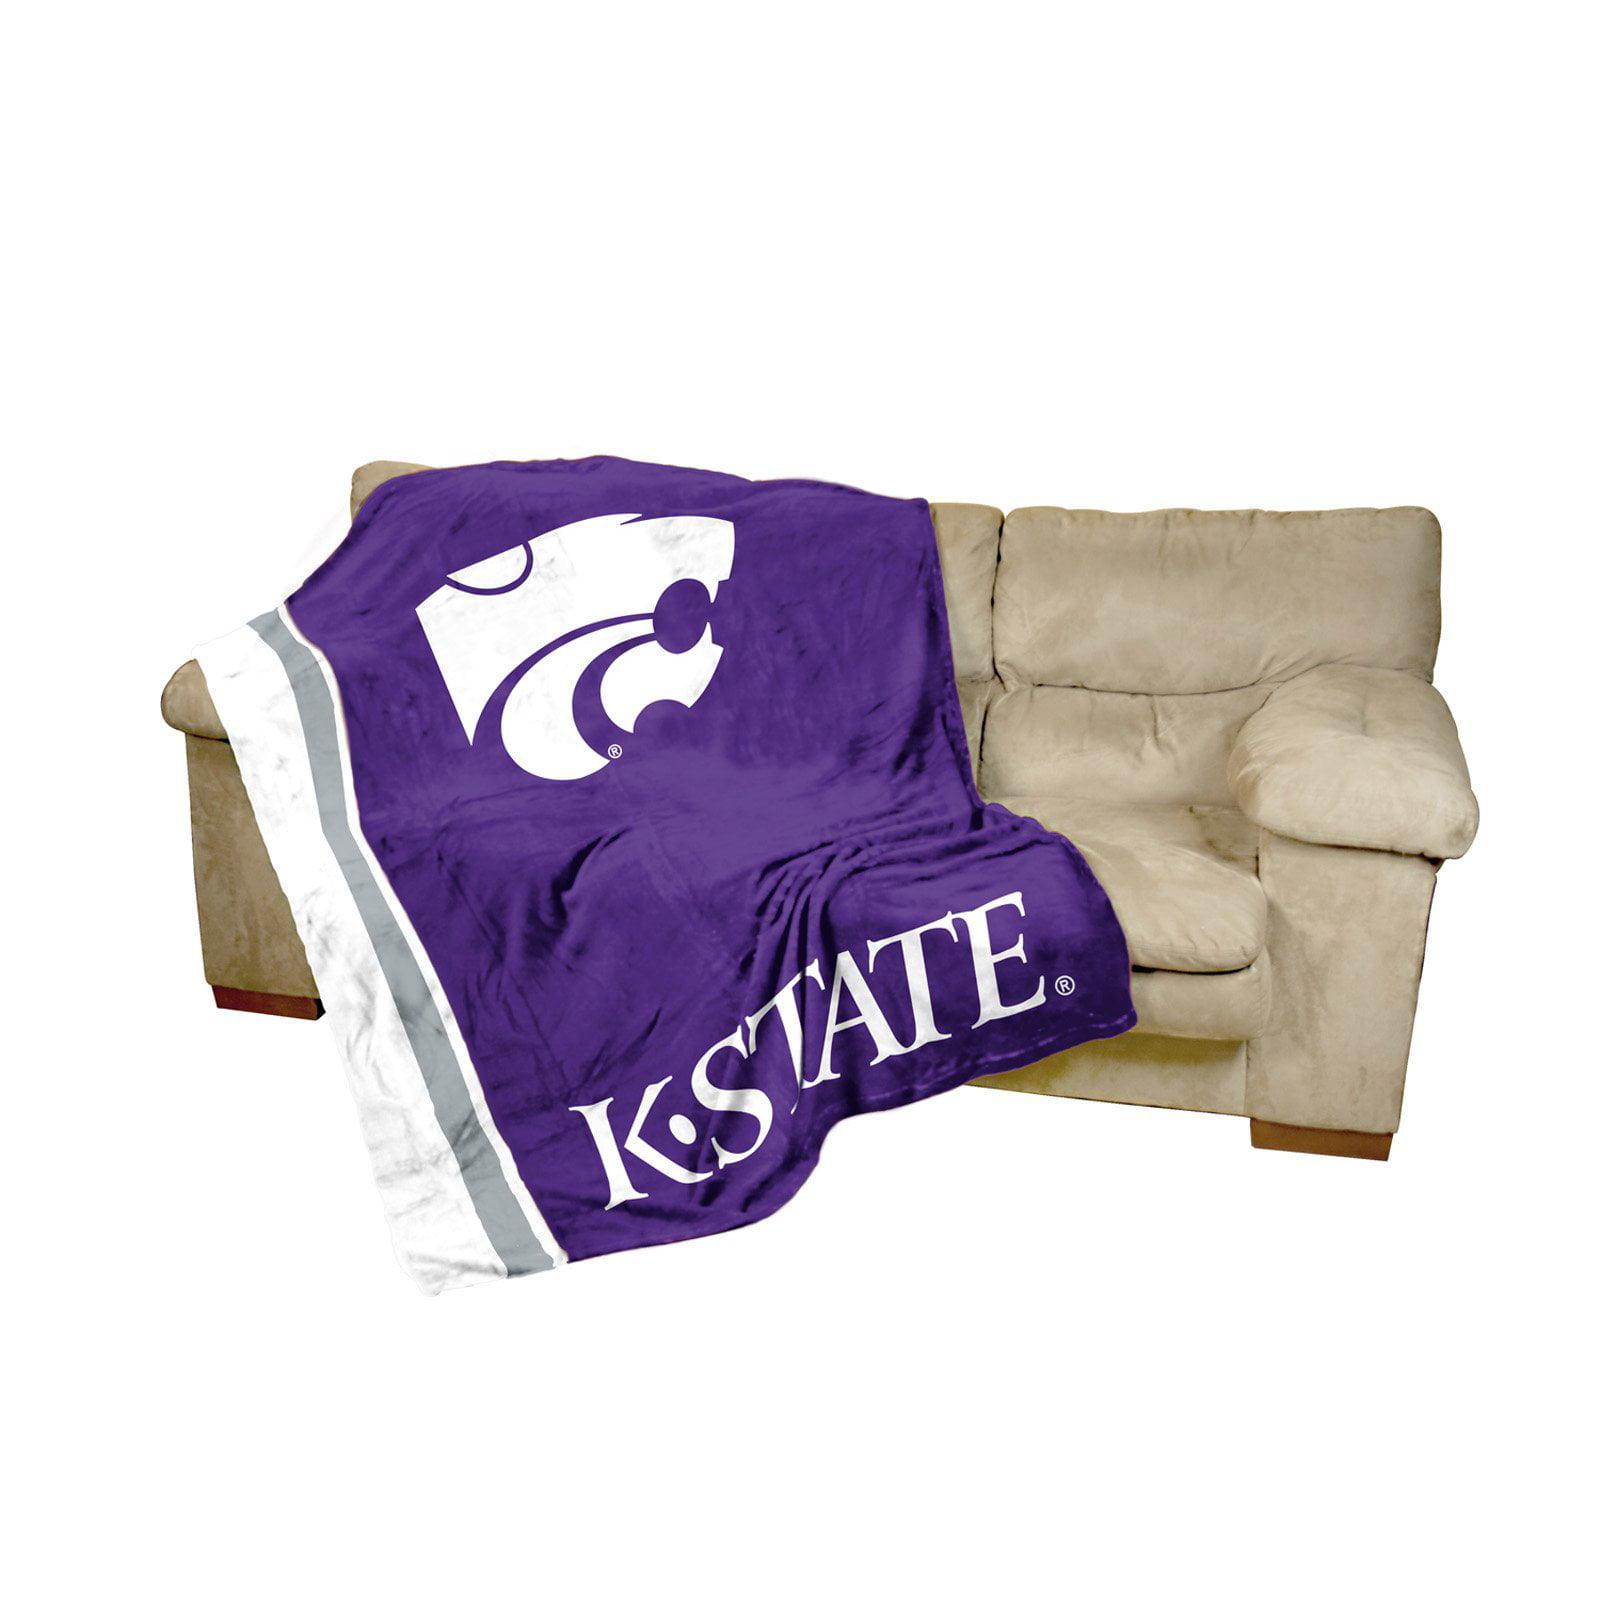 KS State Wildcats UltraSoft Blanket